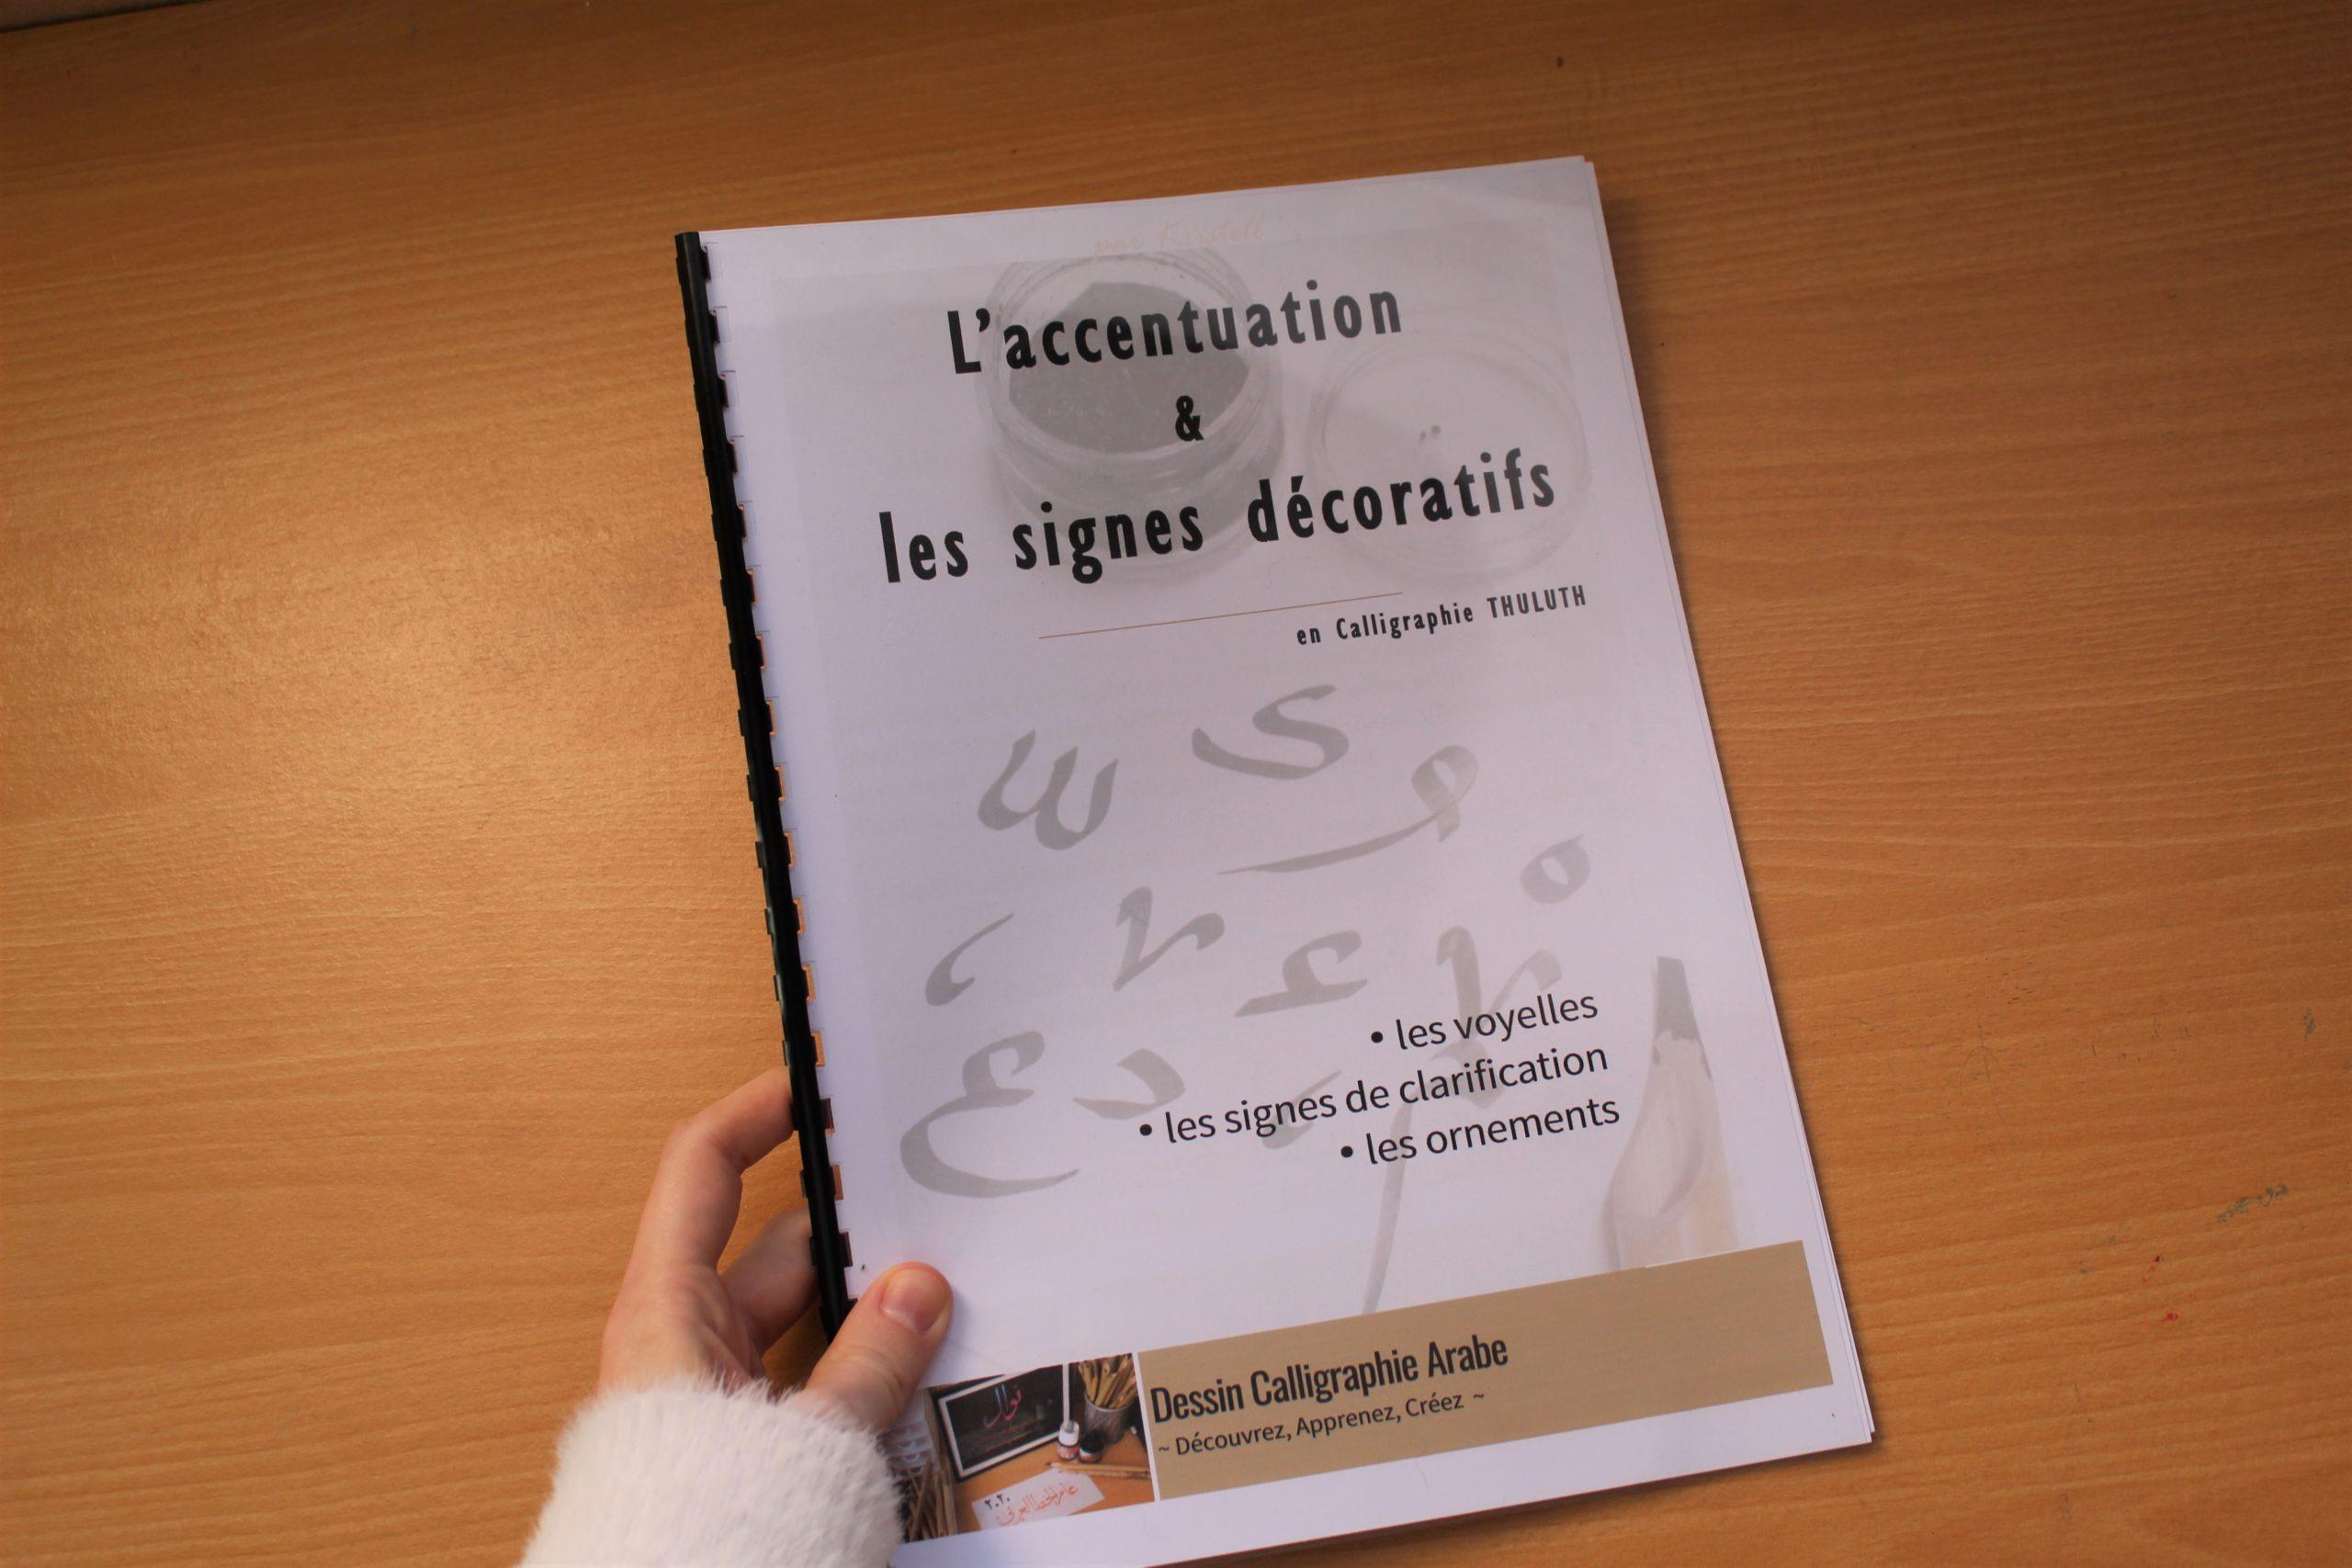 Ebook tashkeel calligraphie arabe